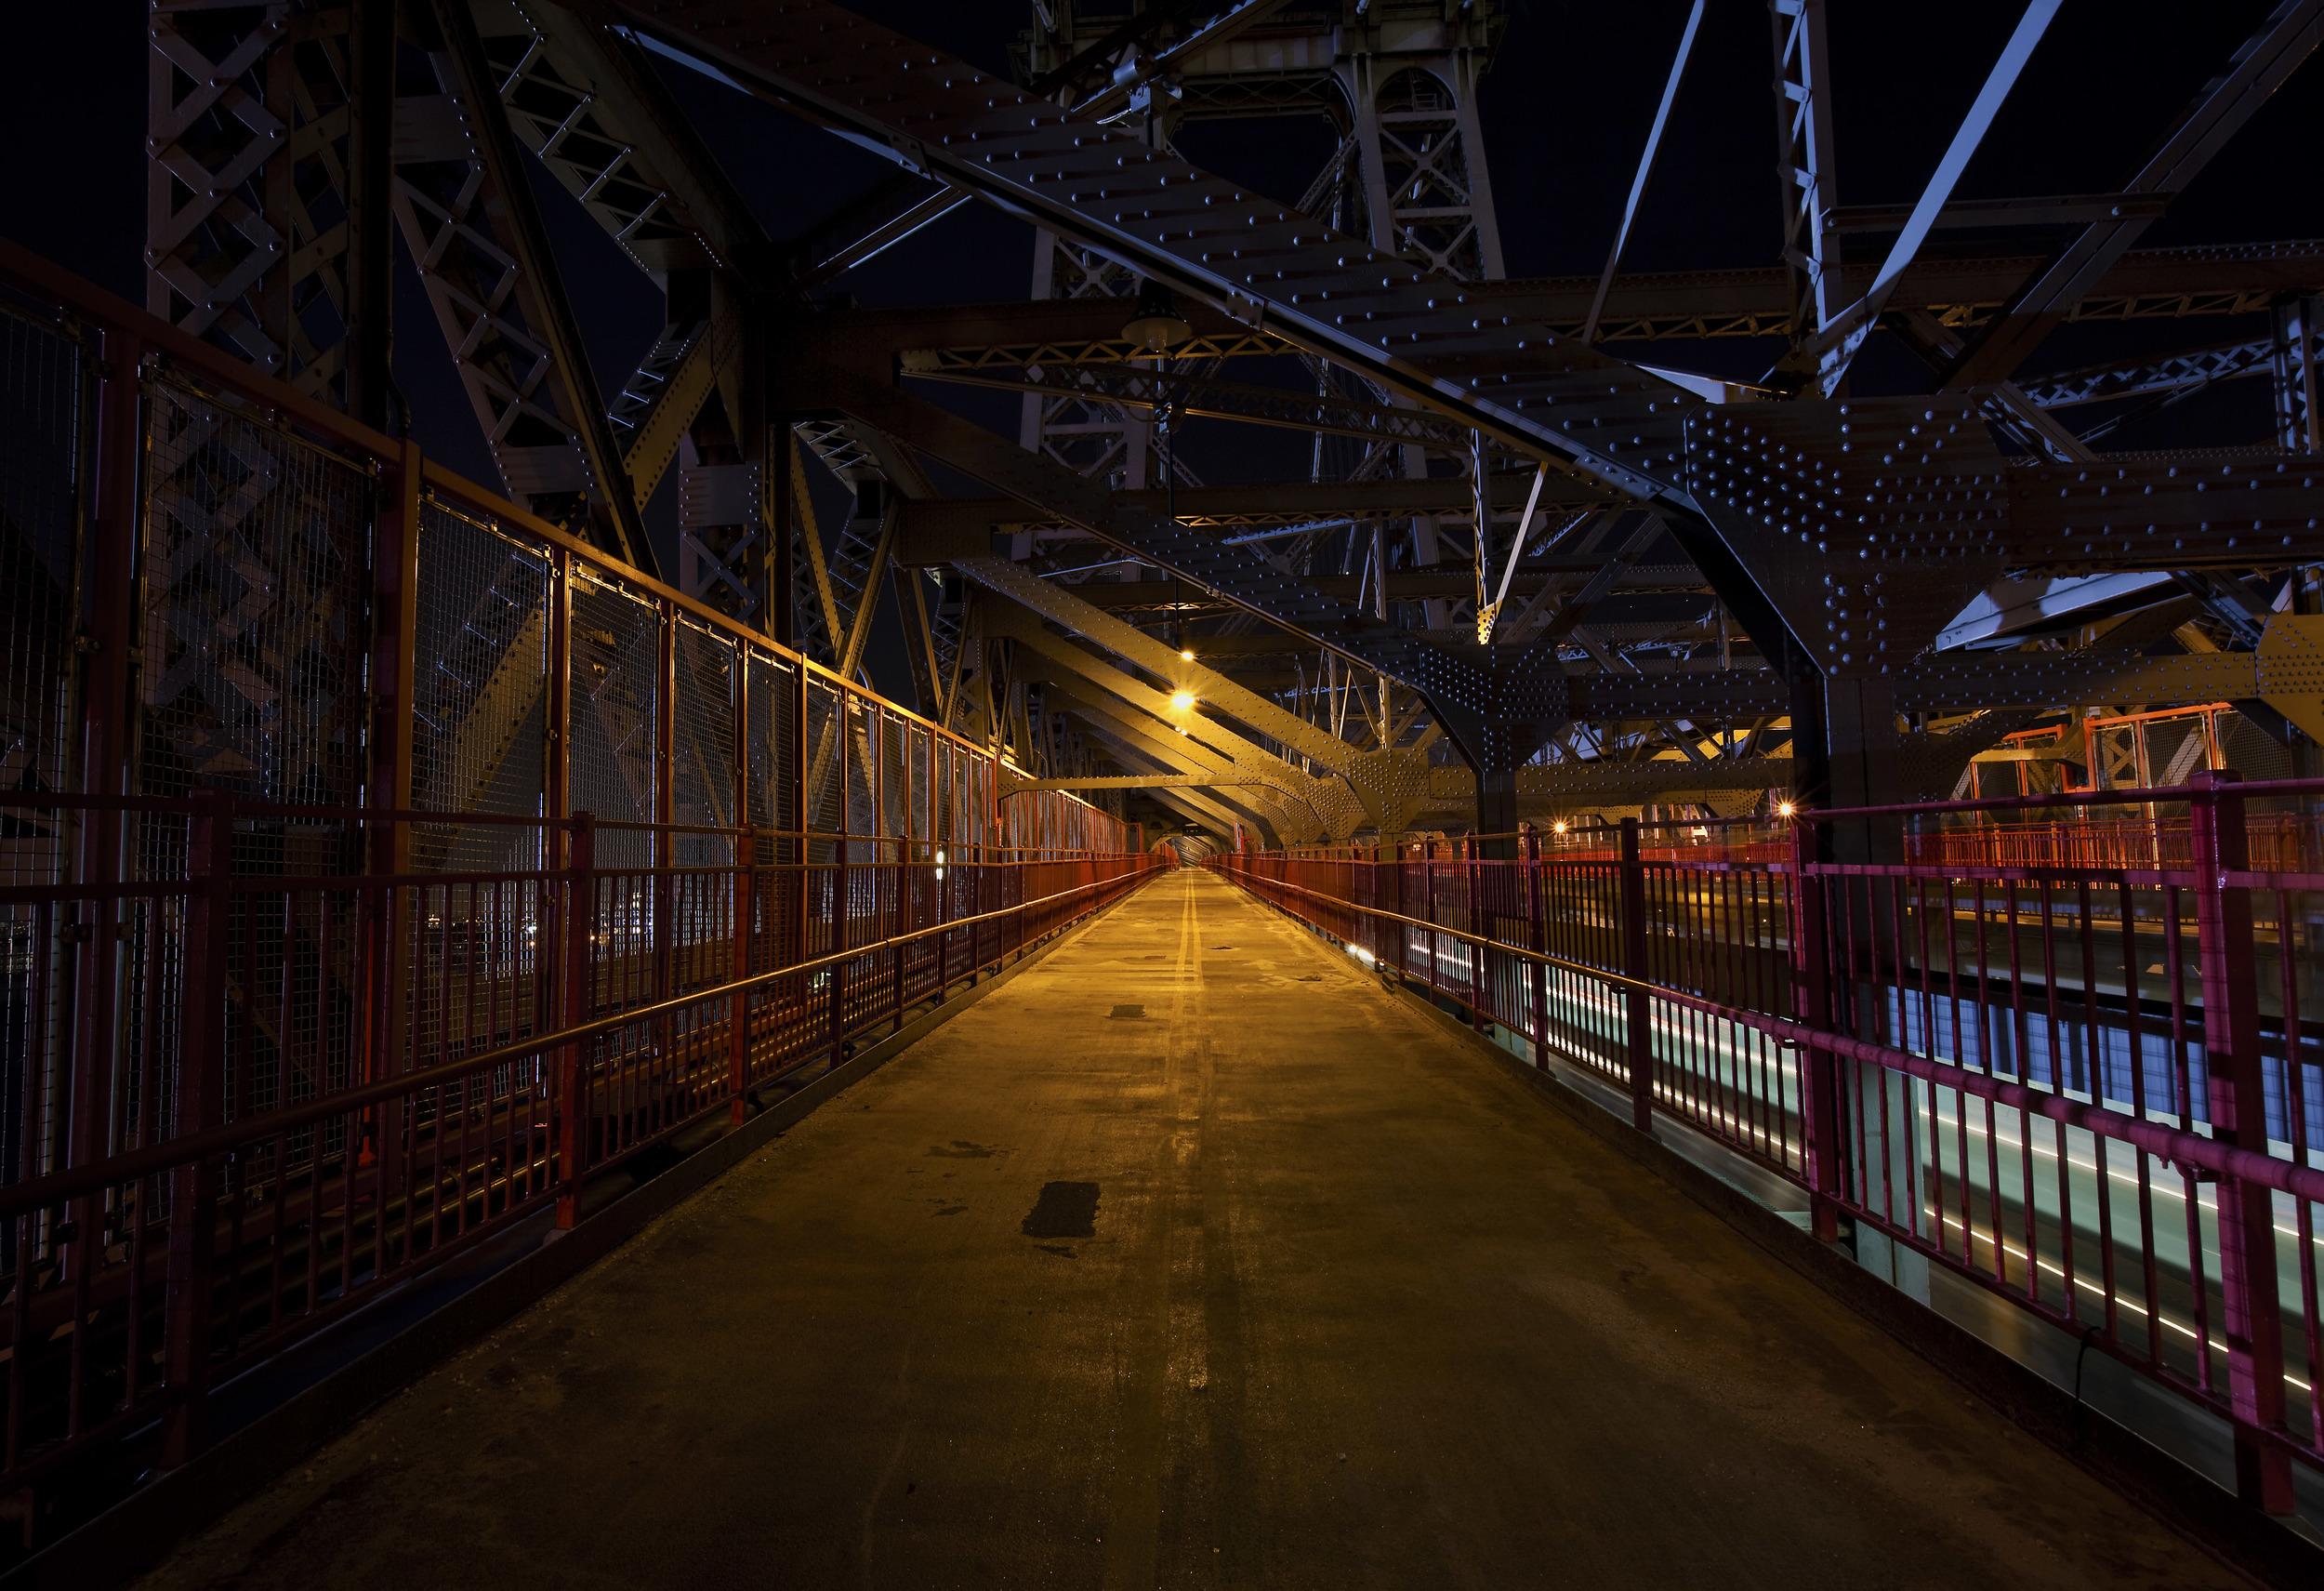 williamsburg_bridge_IMG_4513.jpg